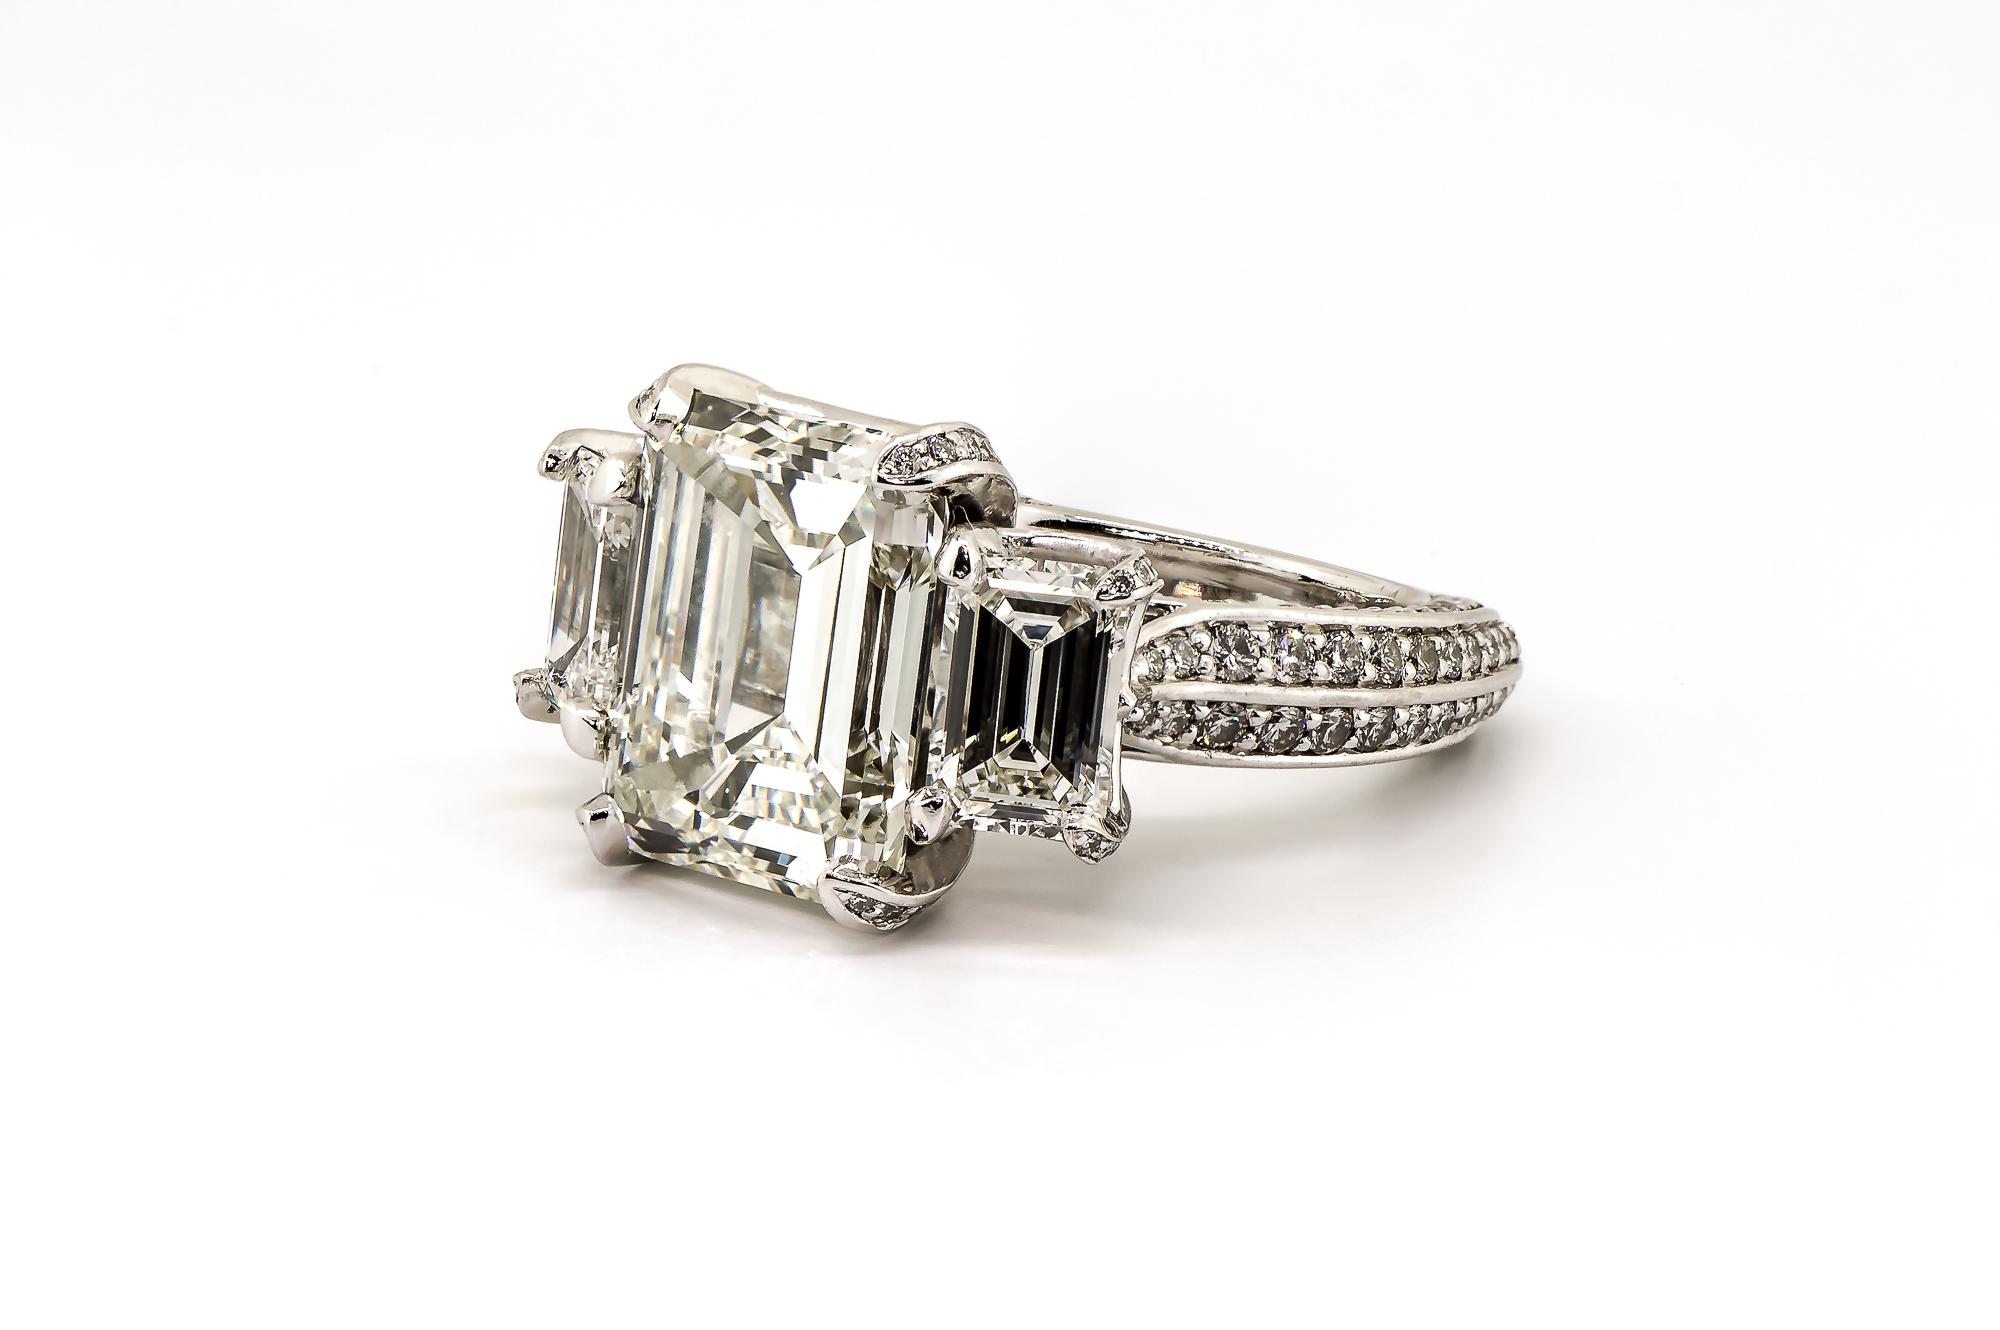 kyla 3 emerald cut ring (1 of 1).jpg